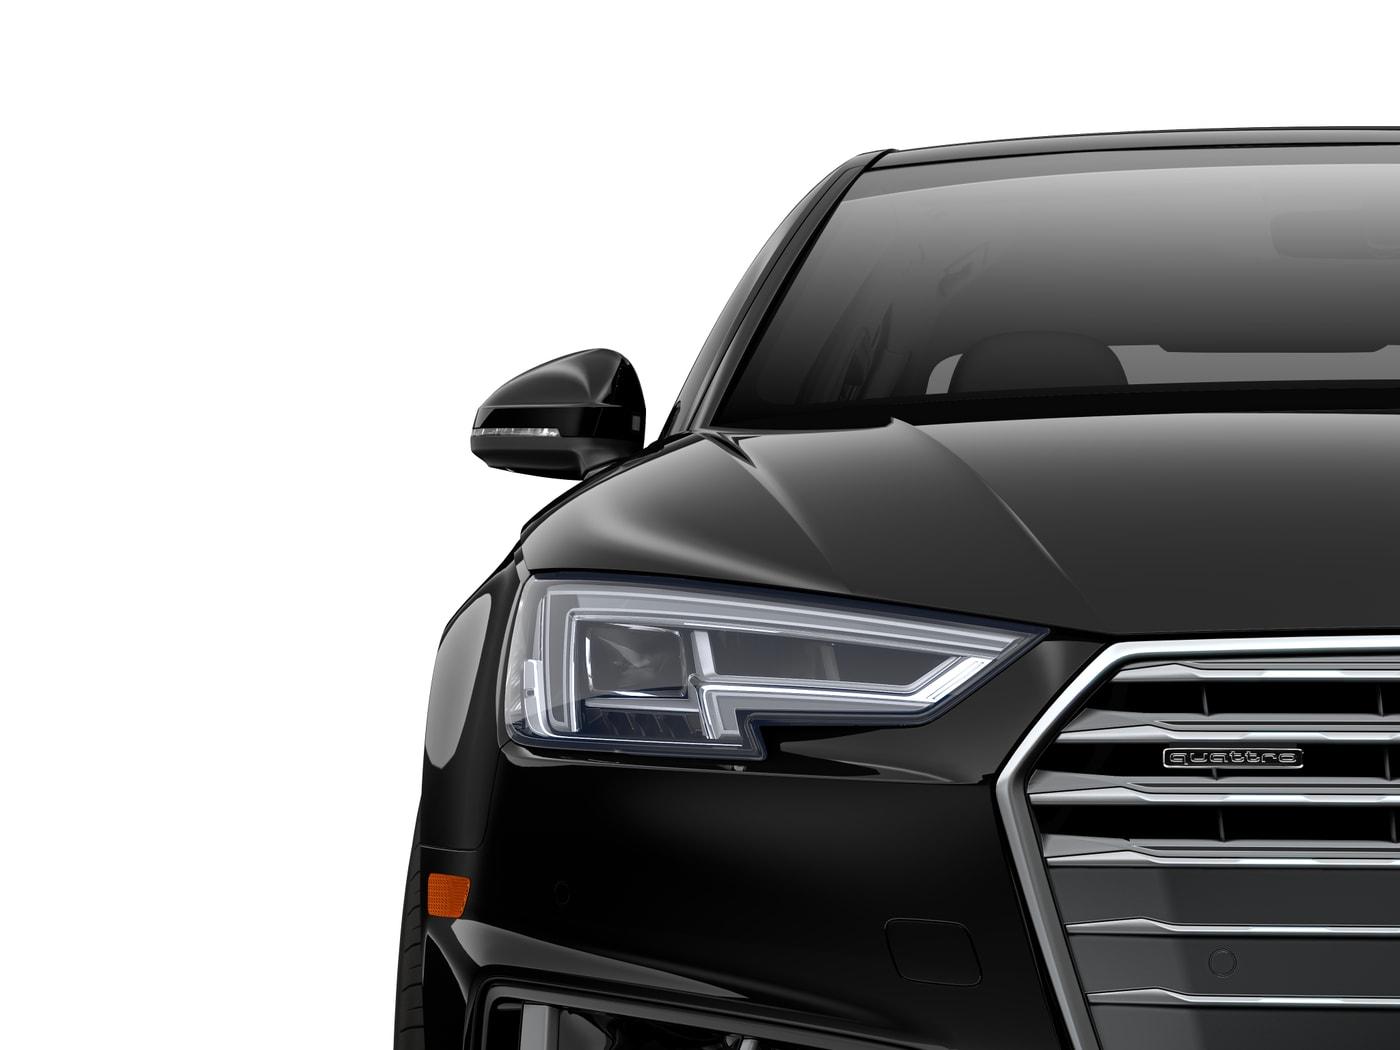 New 2019 Audi A4 For Sale at Audi Dayton | VIN